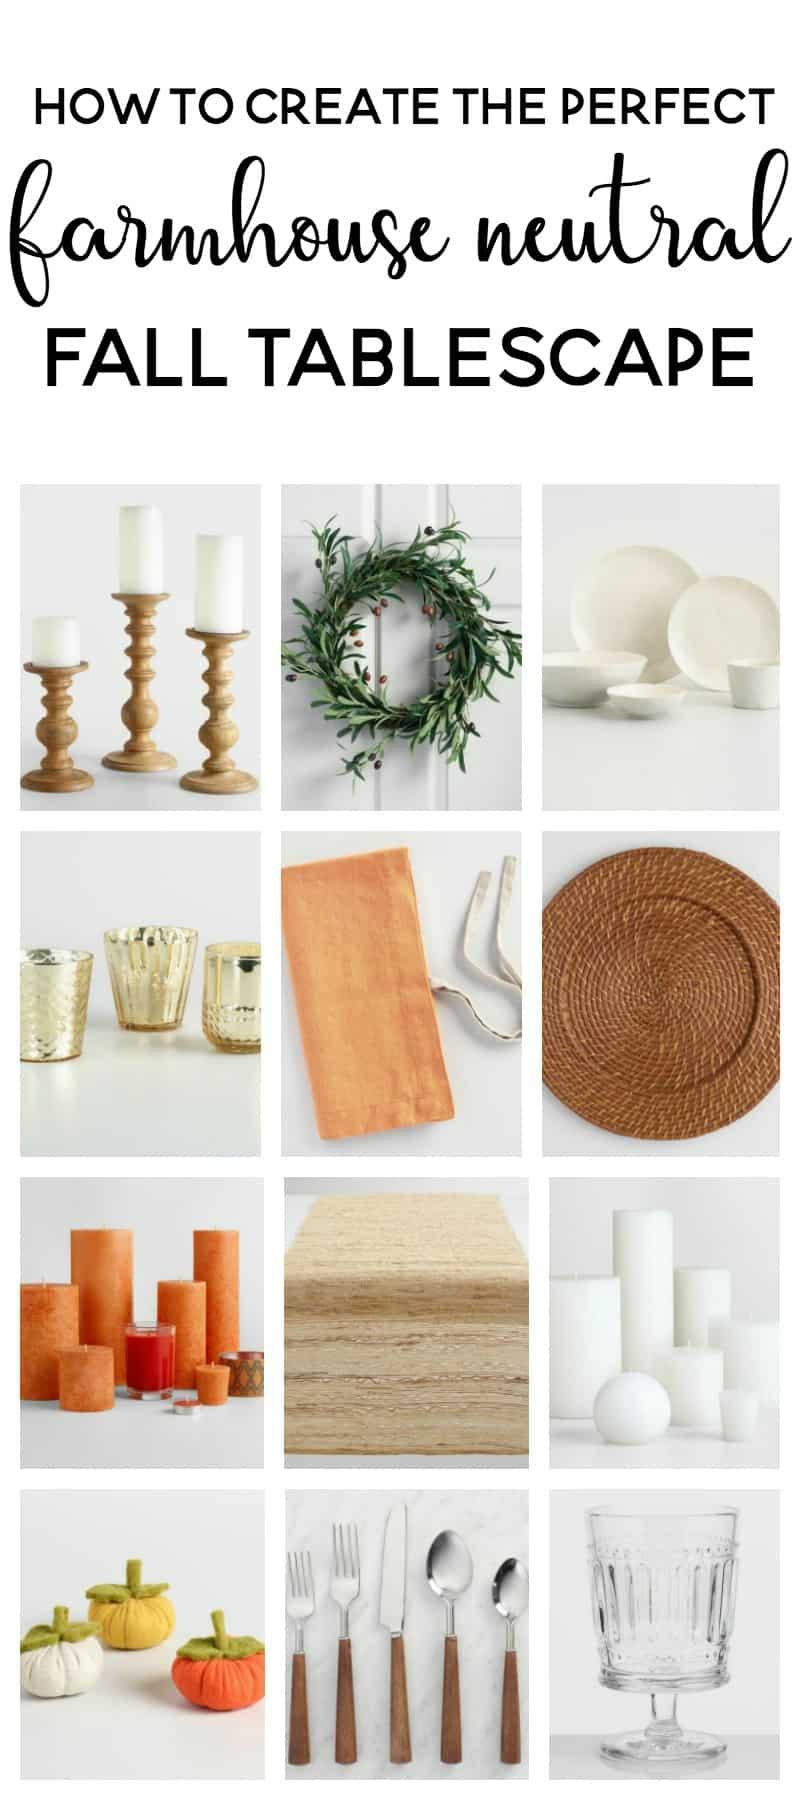 How to Create the Perfect Farmhouse Neutral Fall Tablescape @makingjoysarah for @worldmarket #worldmarket #ad #worldmarkettribe